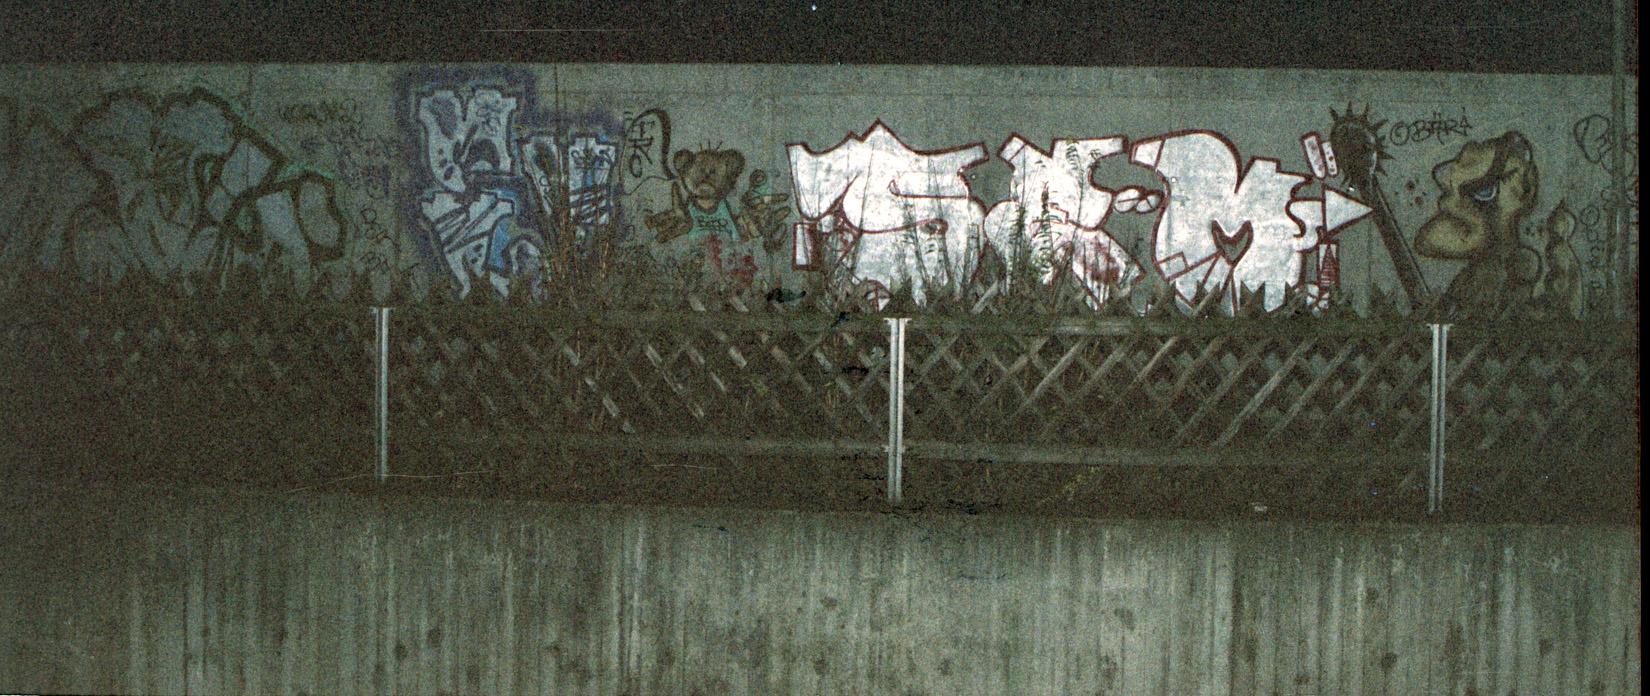 Frankfurt_Graffiti_1988_1989_H88_FRC (21 von 25)